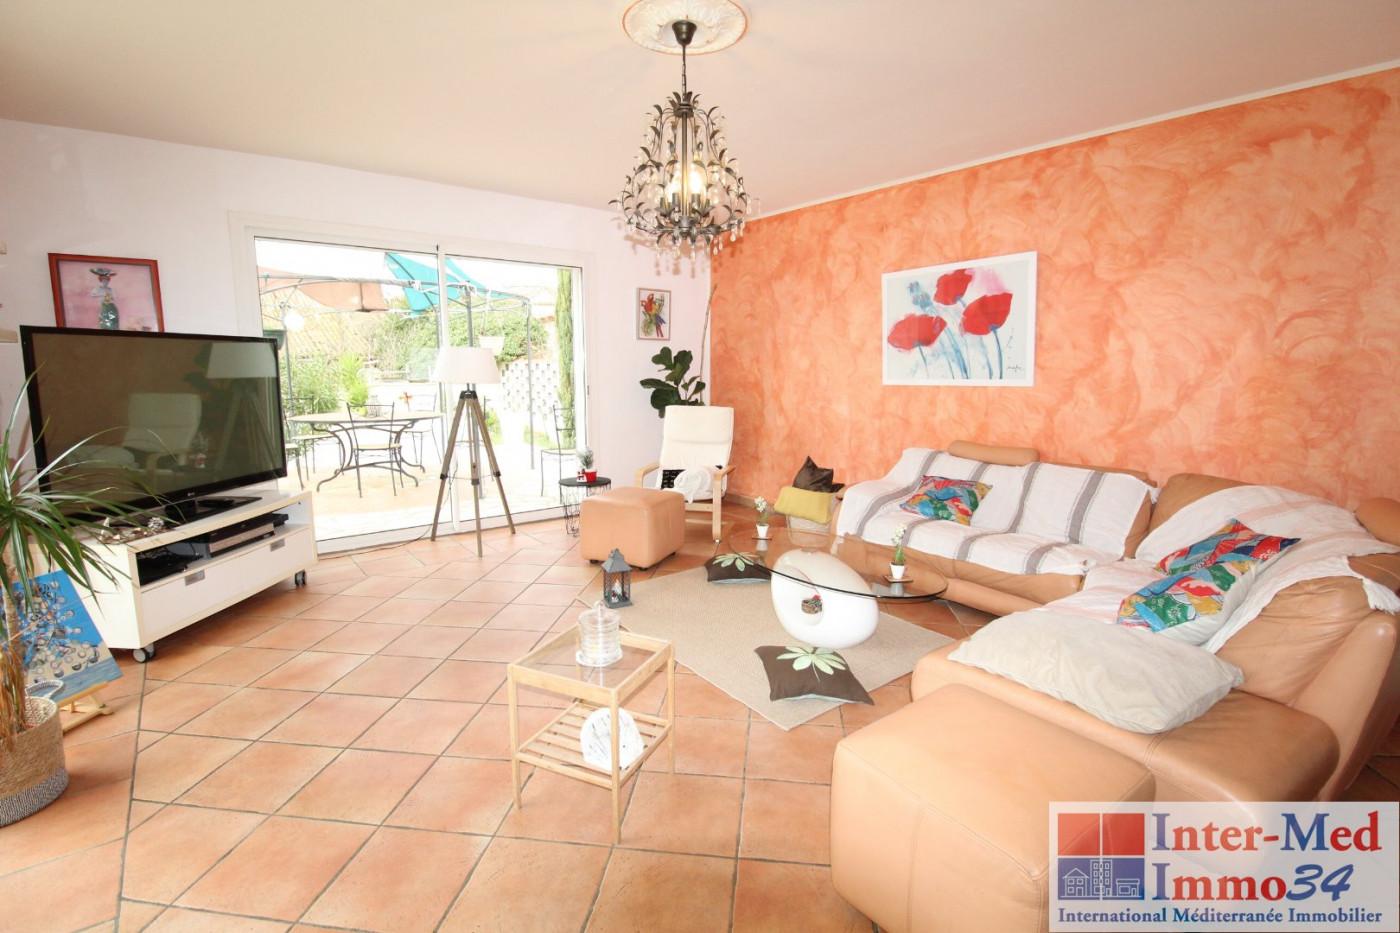 A vendre  Murviel Les Beziers   Réf 3458144076 - Inter-med-immo34